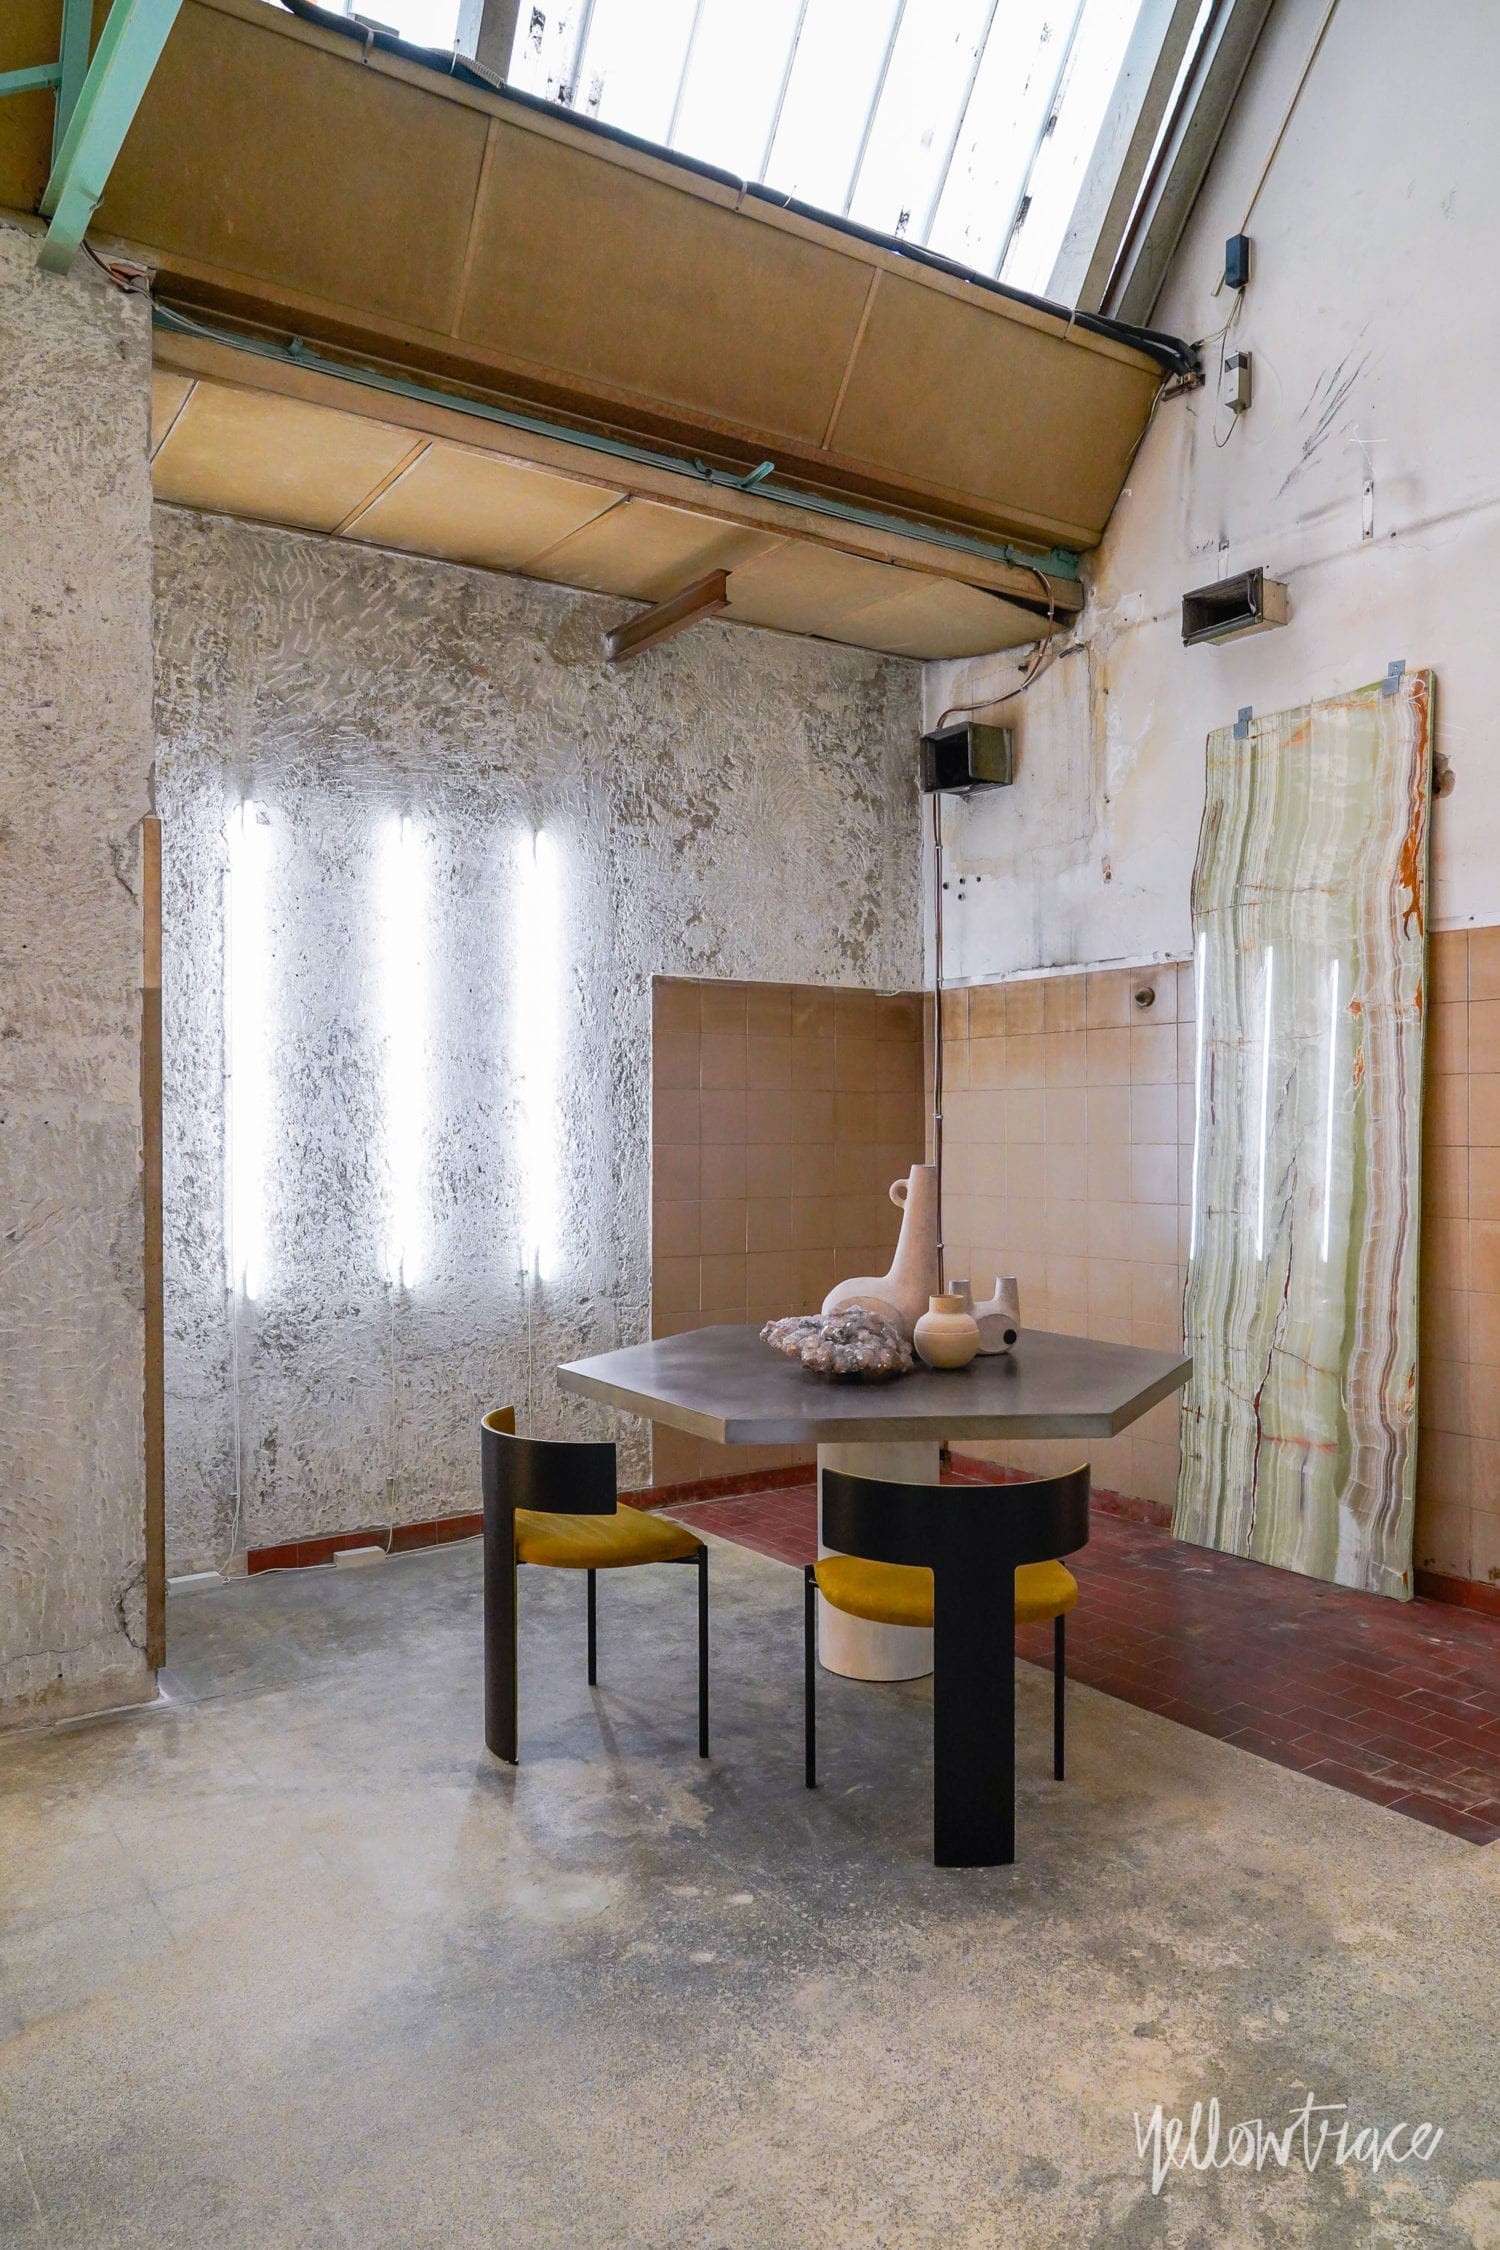 Les Arcanistes Studiopepe At Milan Design Week 2019 Photo Nick Hughes Yellowtrace 27